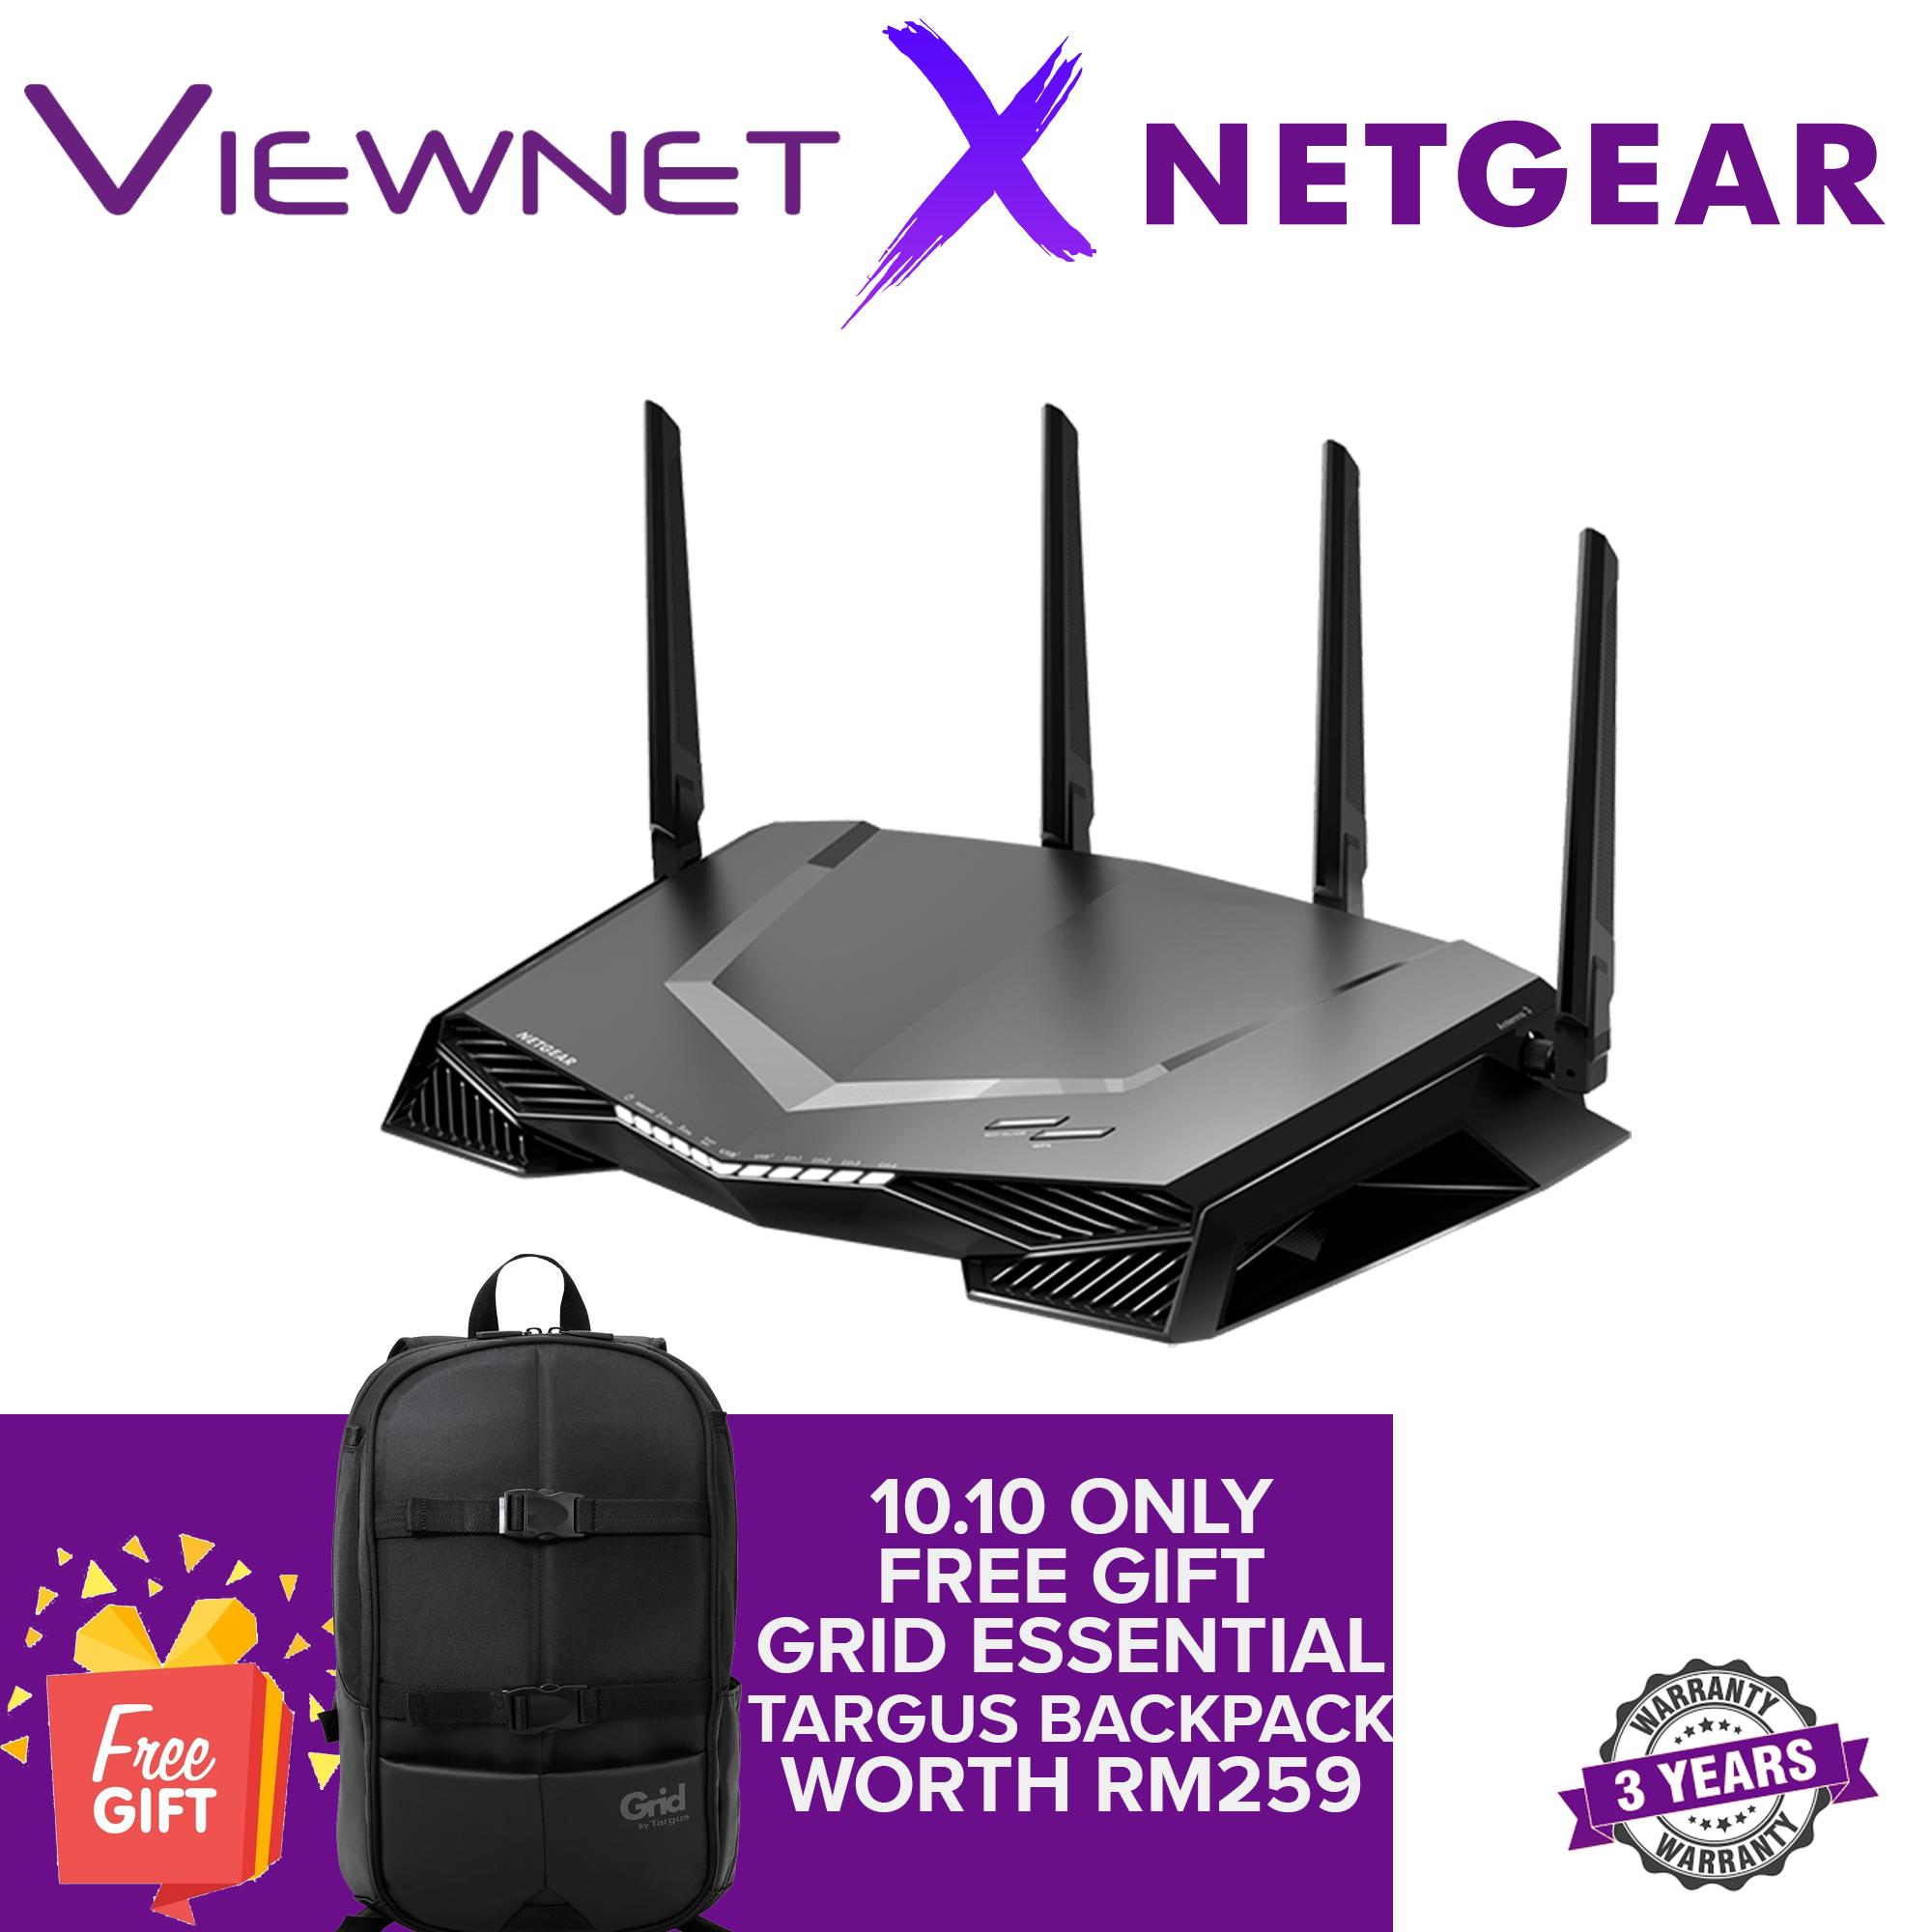 Netgear XR500 AC2600 Dual Band Nighthawk Pro WiFi Gaming Router